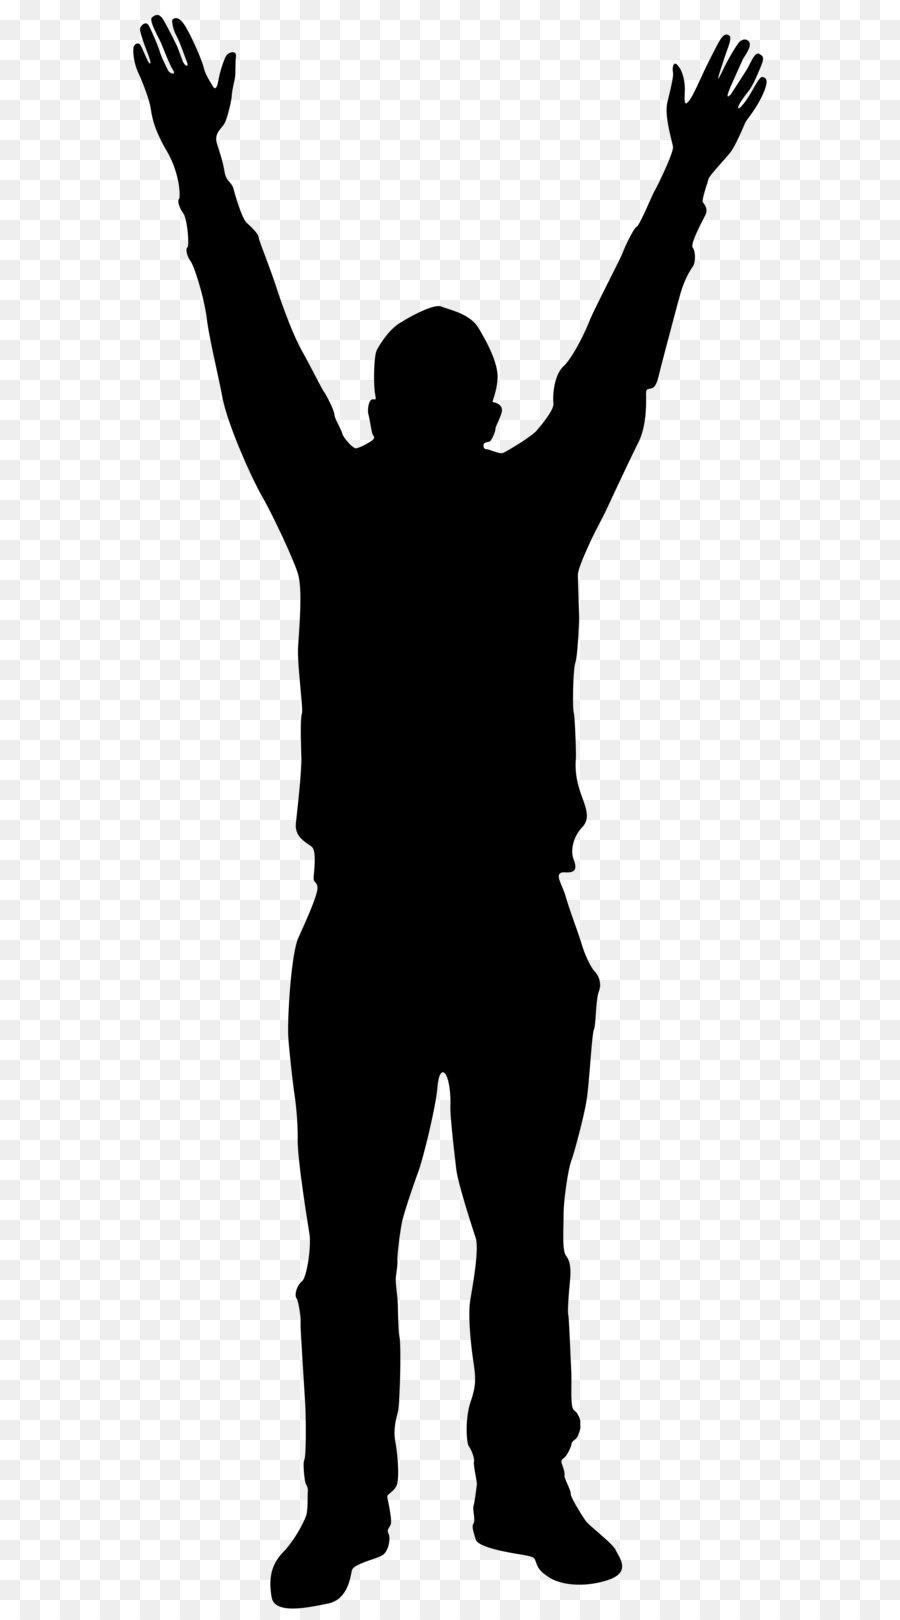 medium resolution of 900x1620 silhouette man clip art